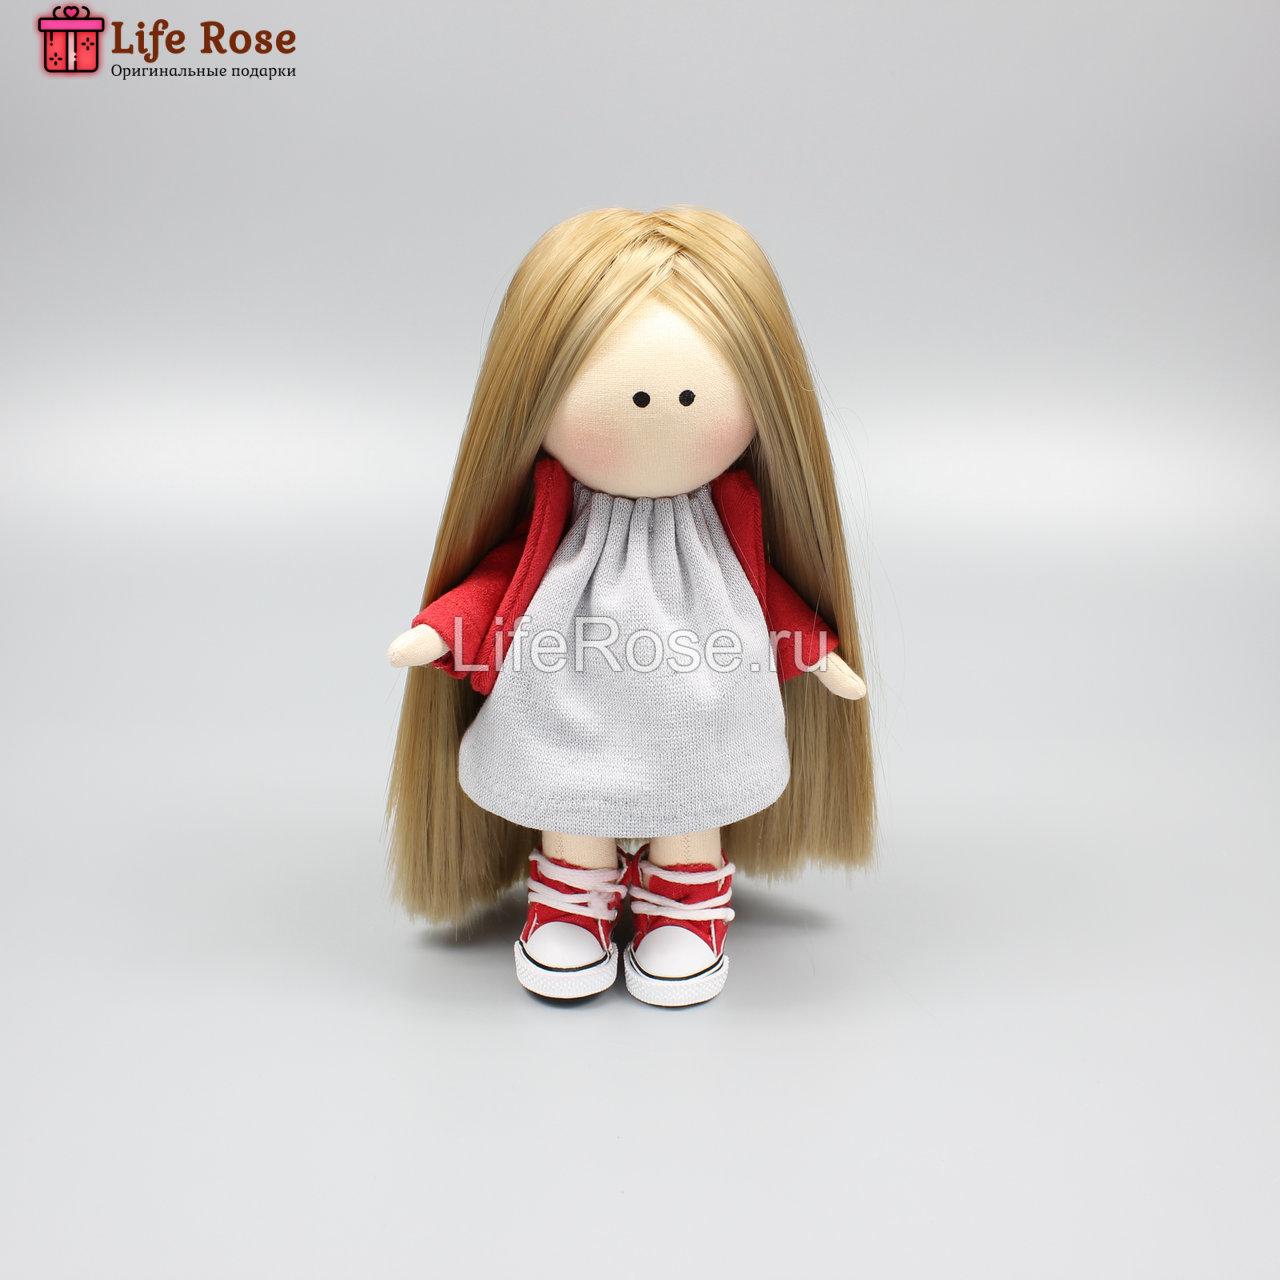 Заказать куклу ручной работы Майя - НА ЗАКАЗ